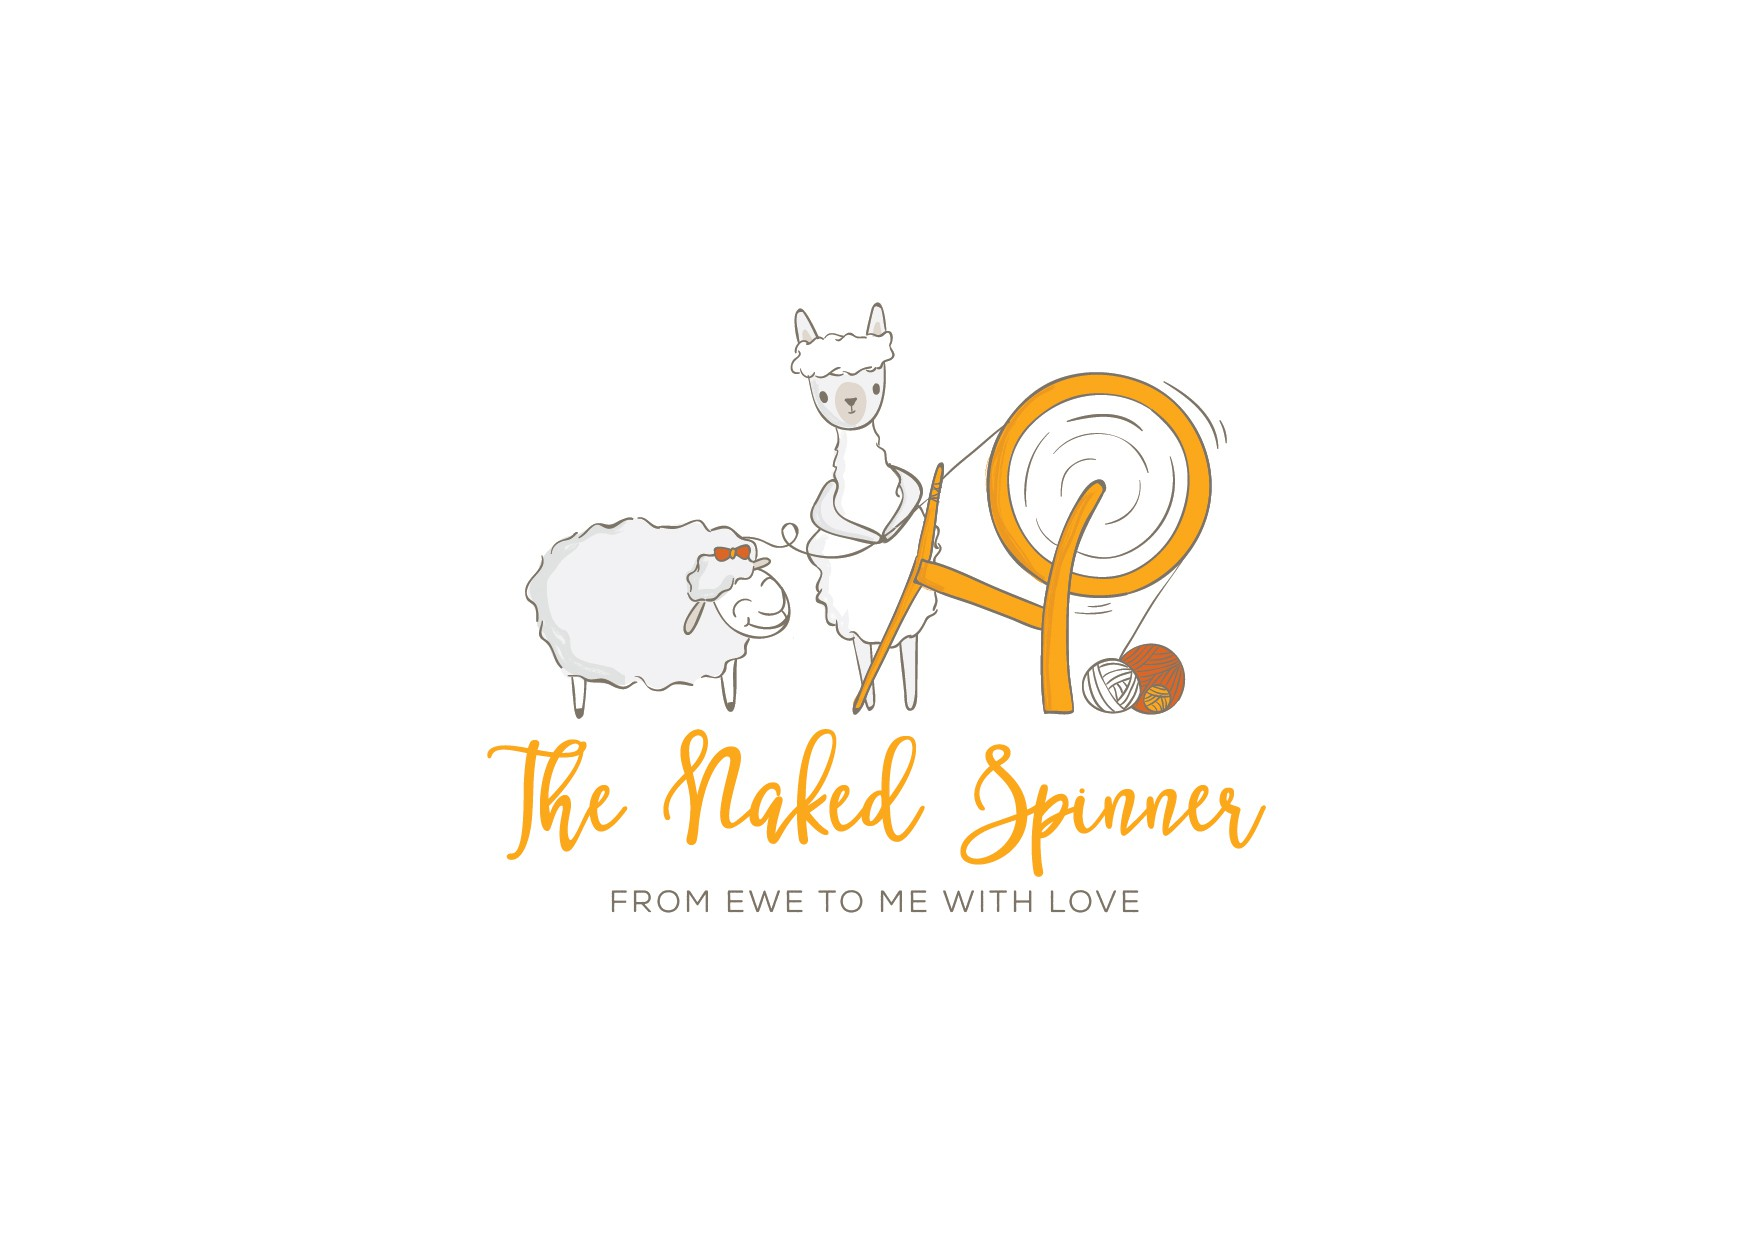 Naked spinner needs a stunning logo!